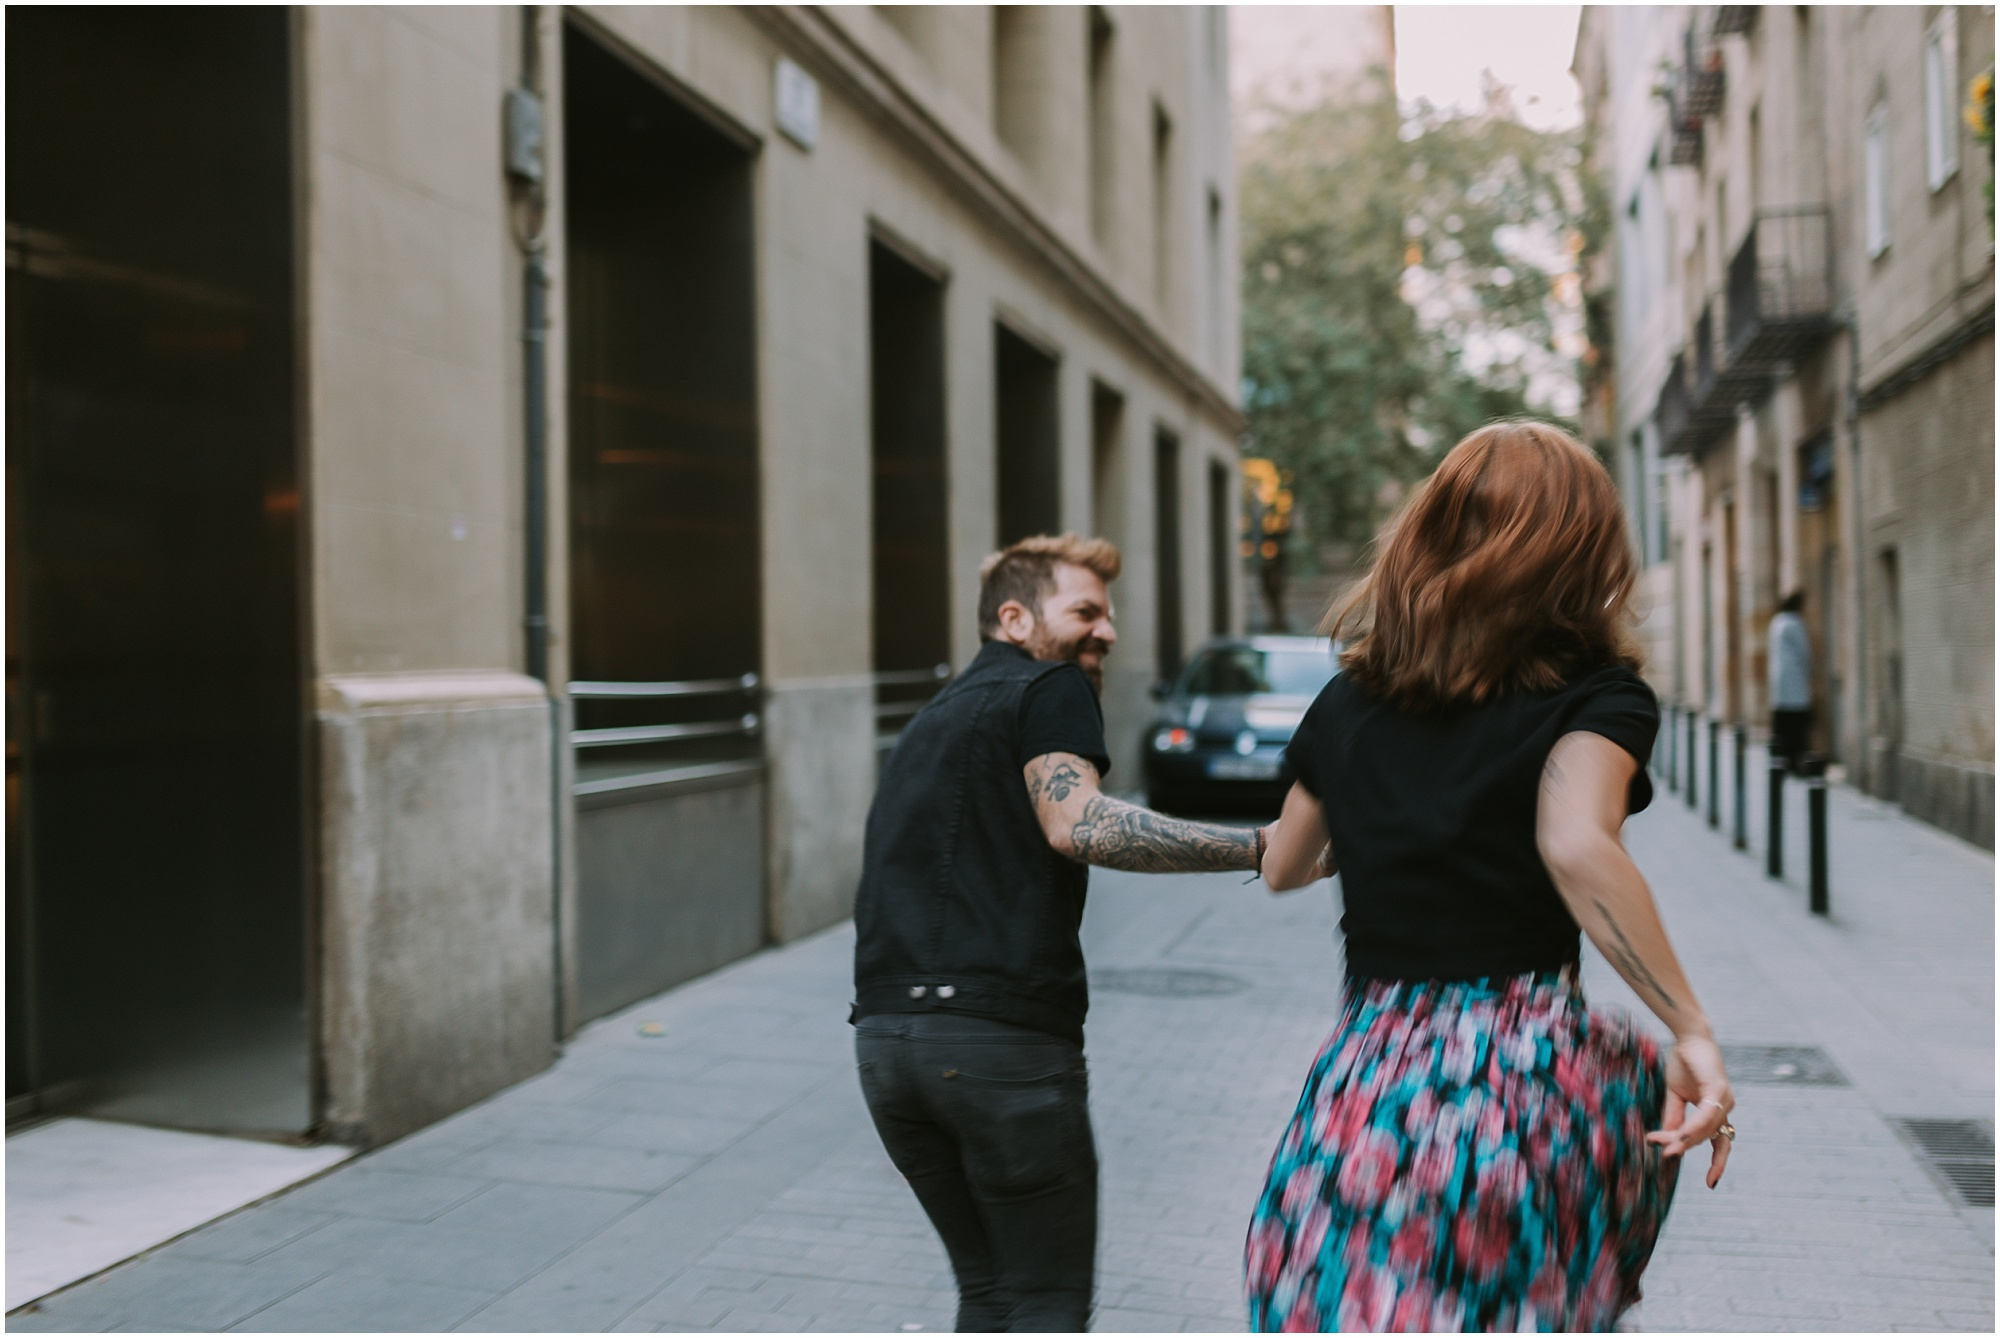 Kateryna-photos-photographer-mariage-boda-love-story-engagement-barcelona_0010.jpg